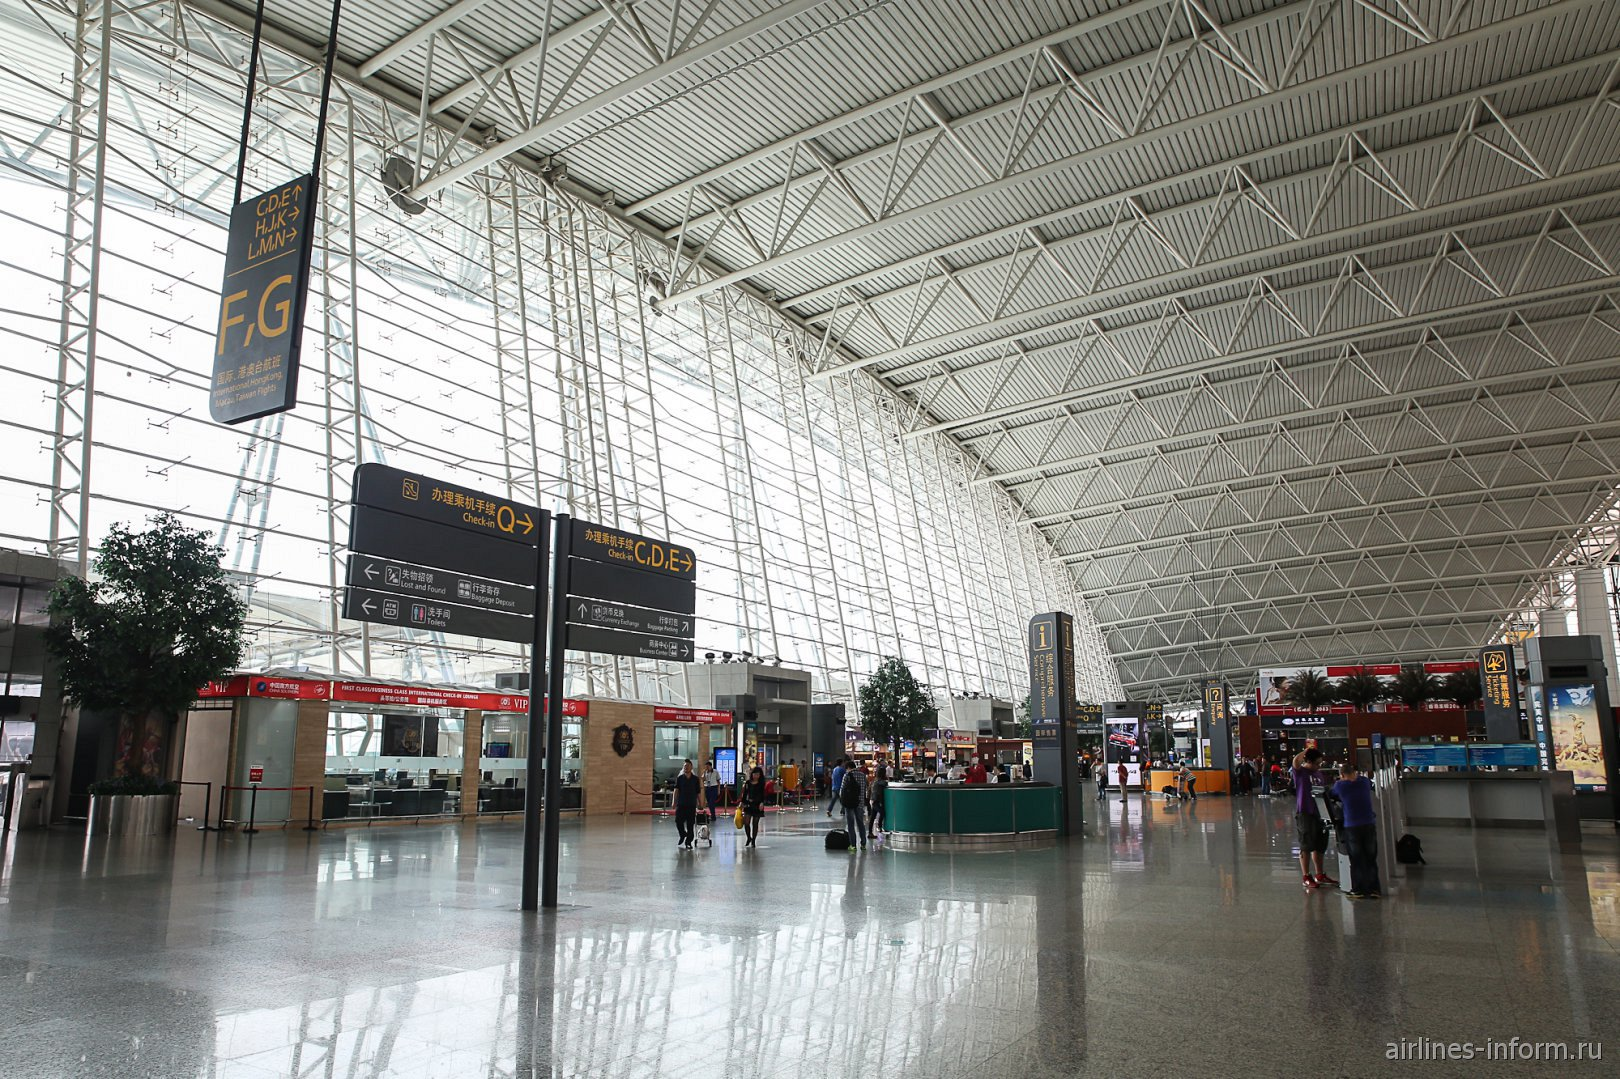 В центре пассажирского терминала аэропорта Гуанчжоу Байюнь